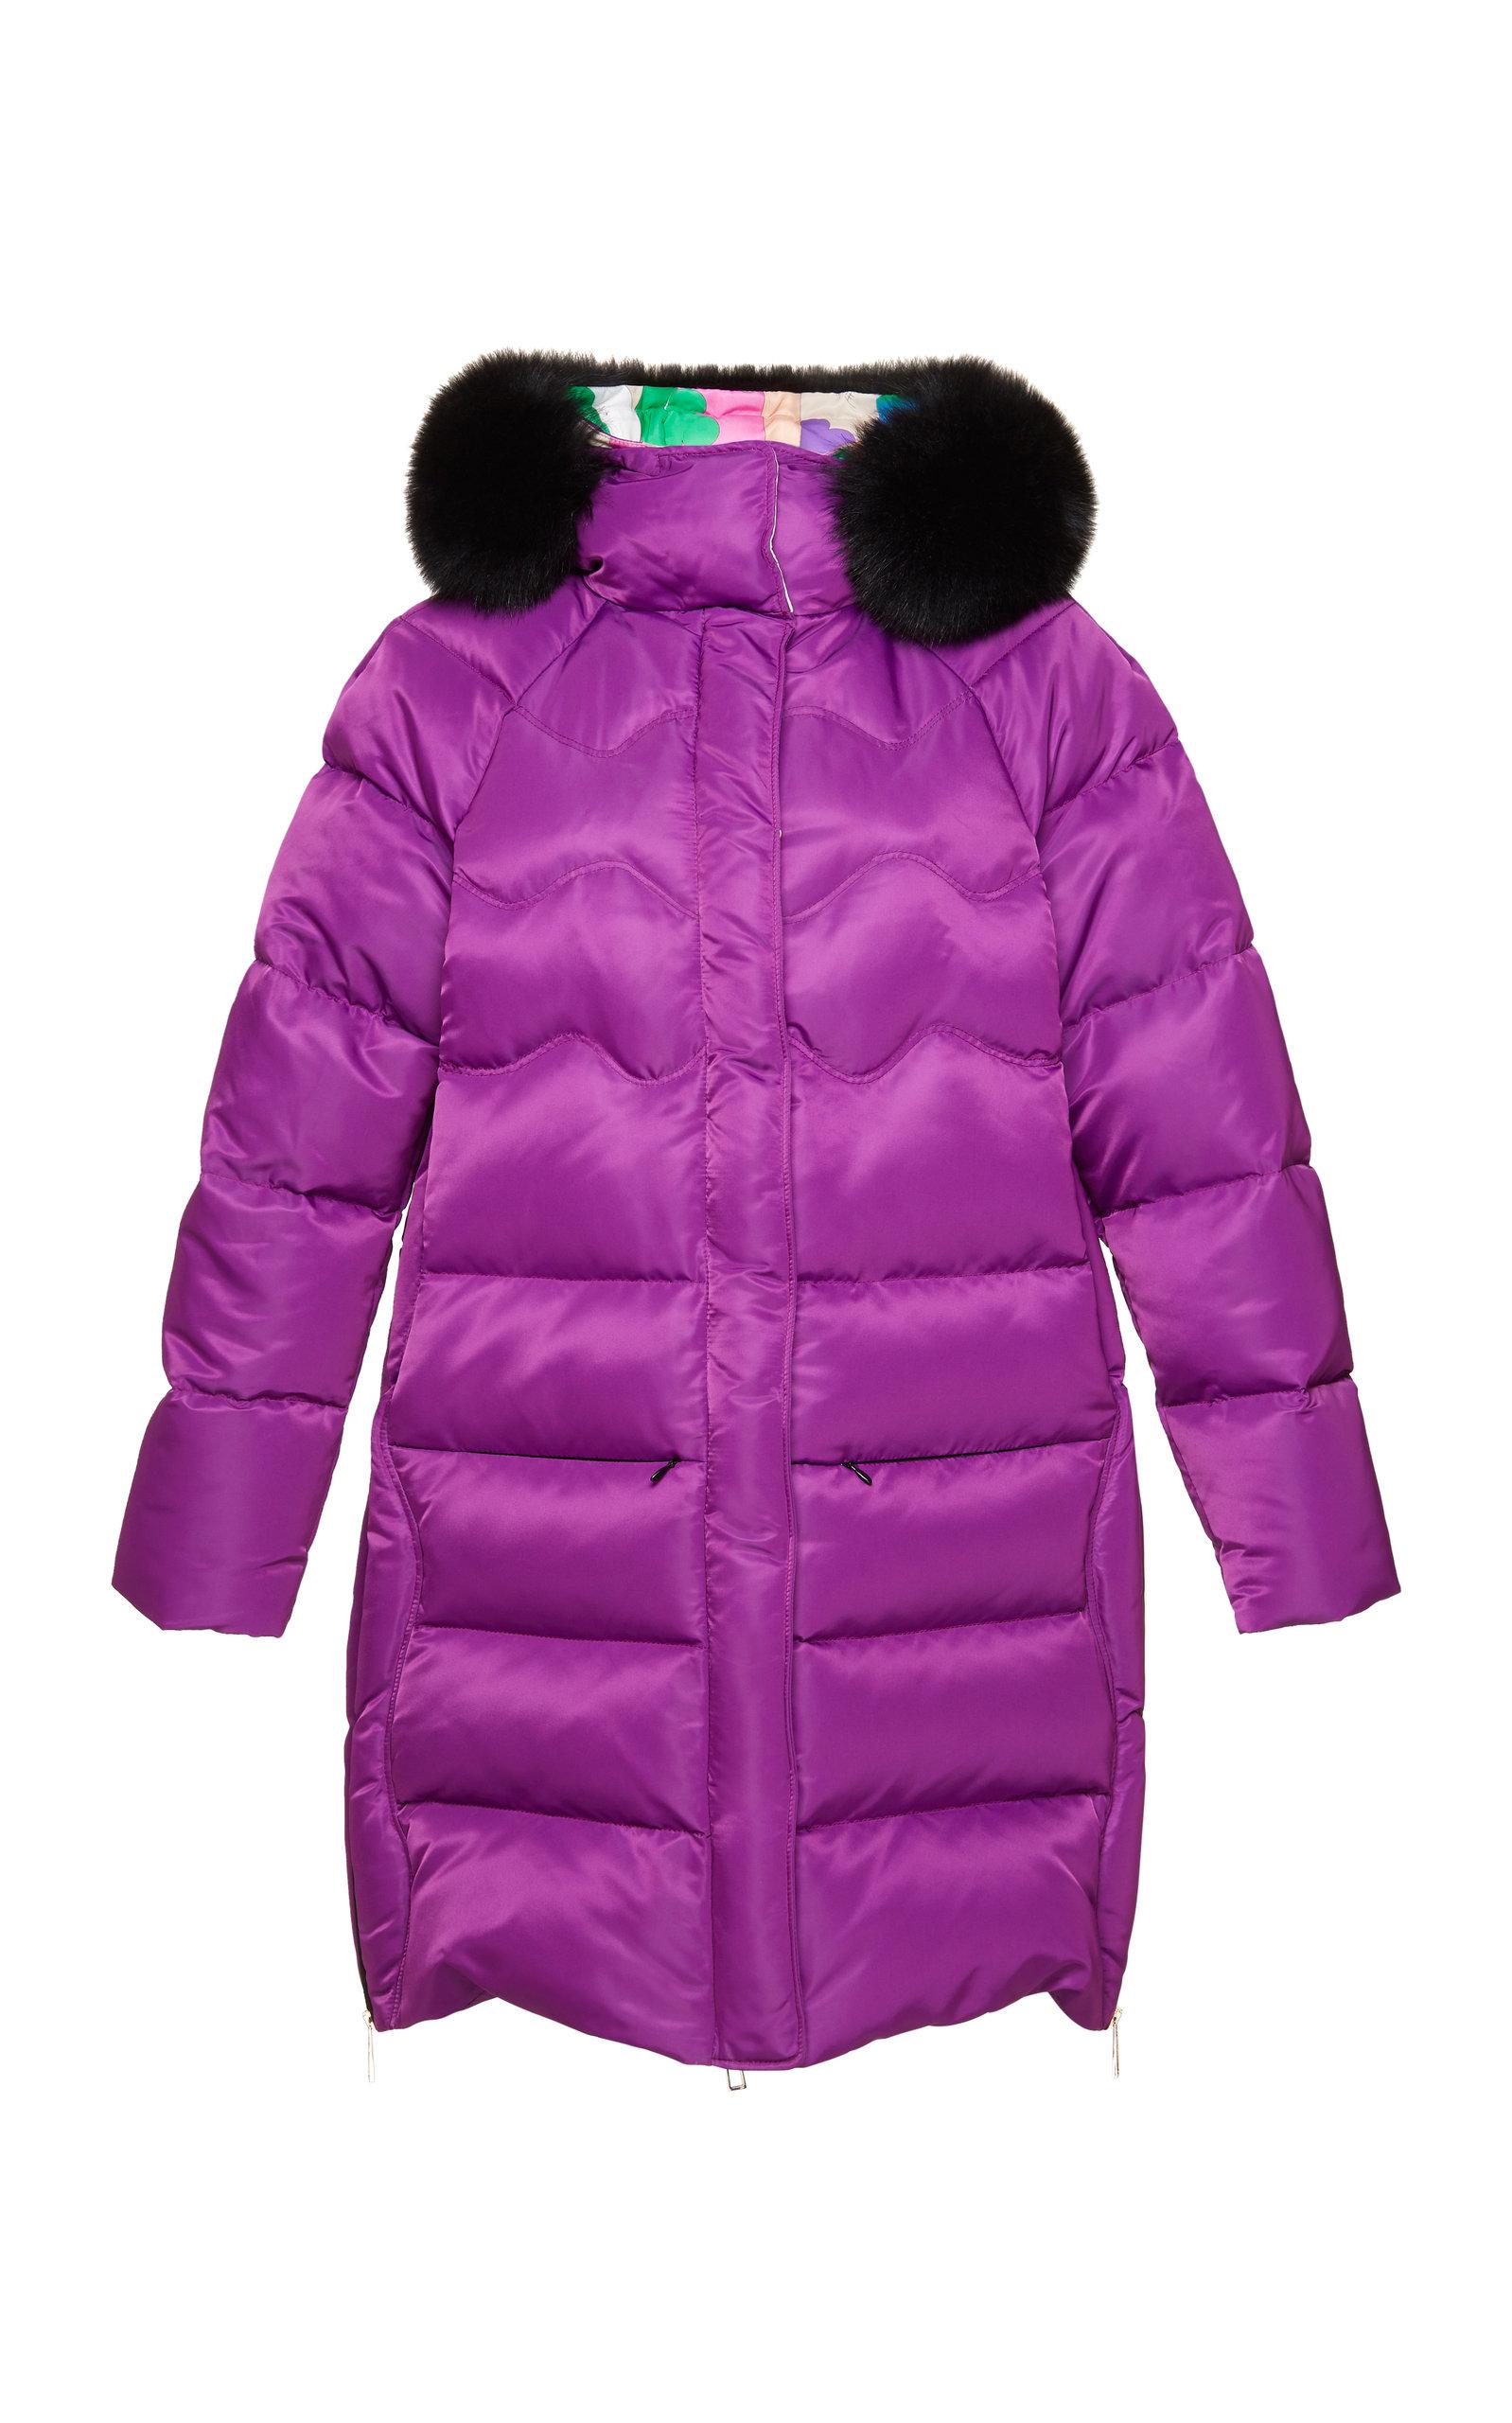 Fur Trimmed Down Coat in Purple